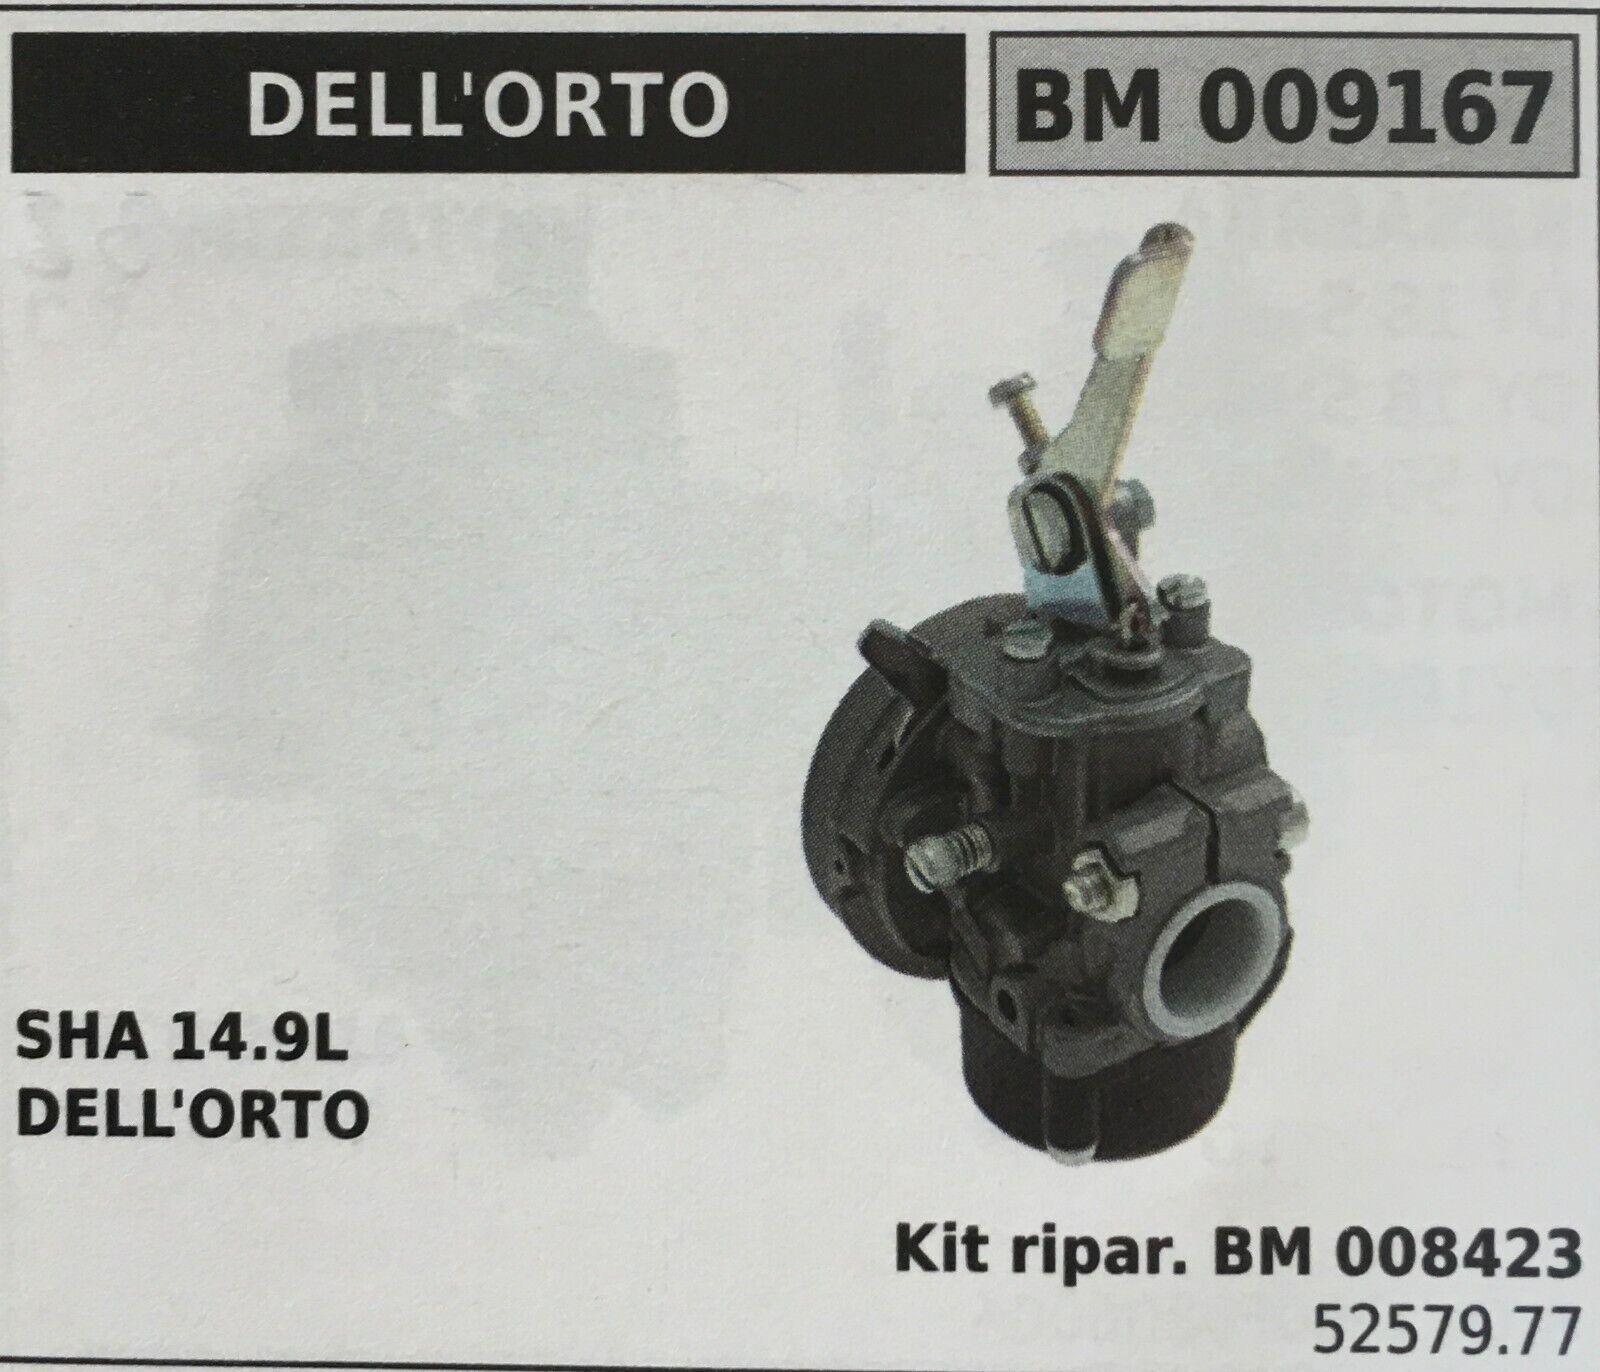 Cocheburador a Tanque Brumar Dell'Orto BM009167